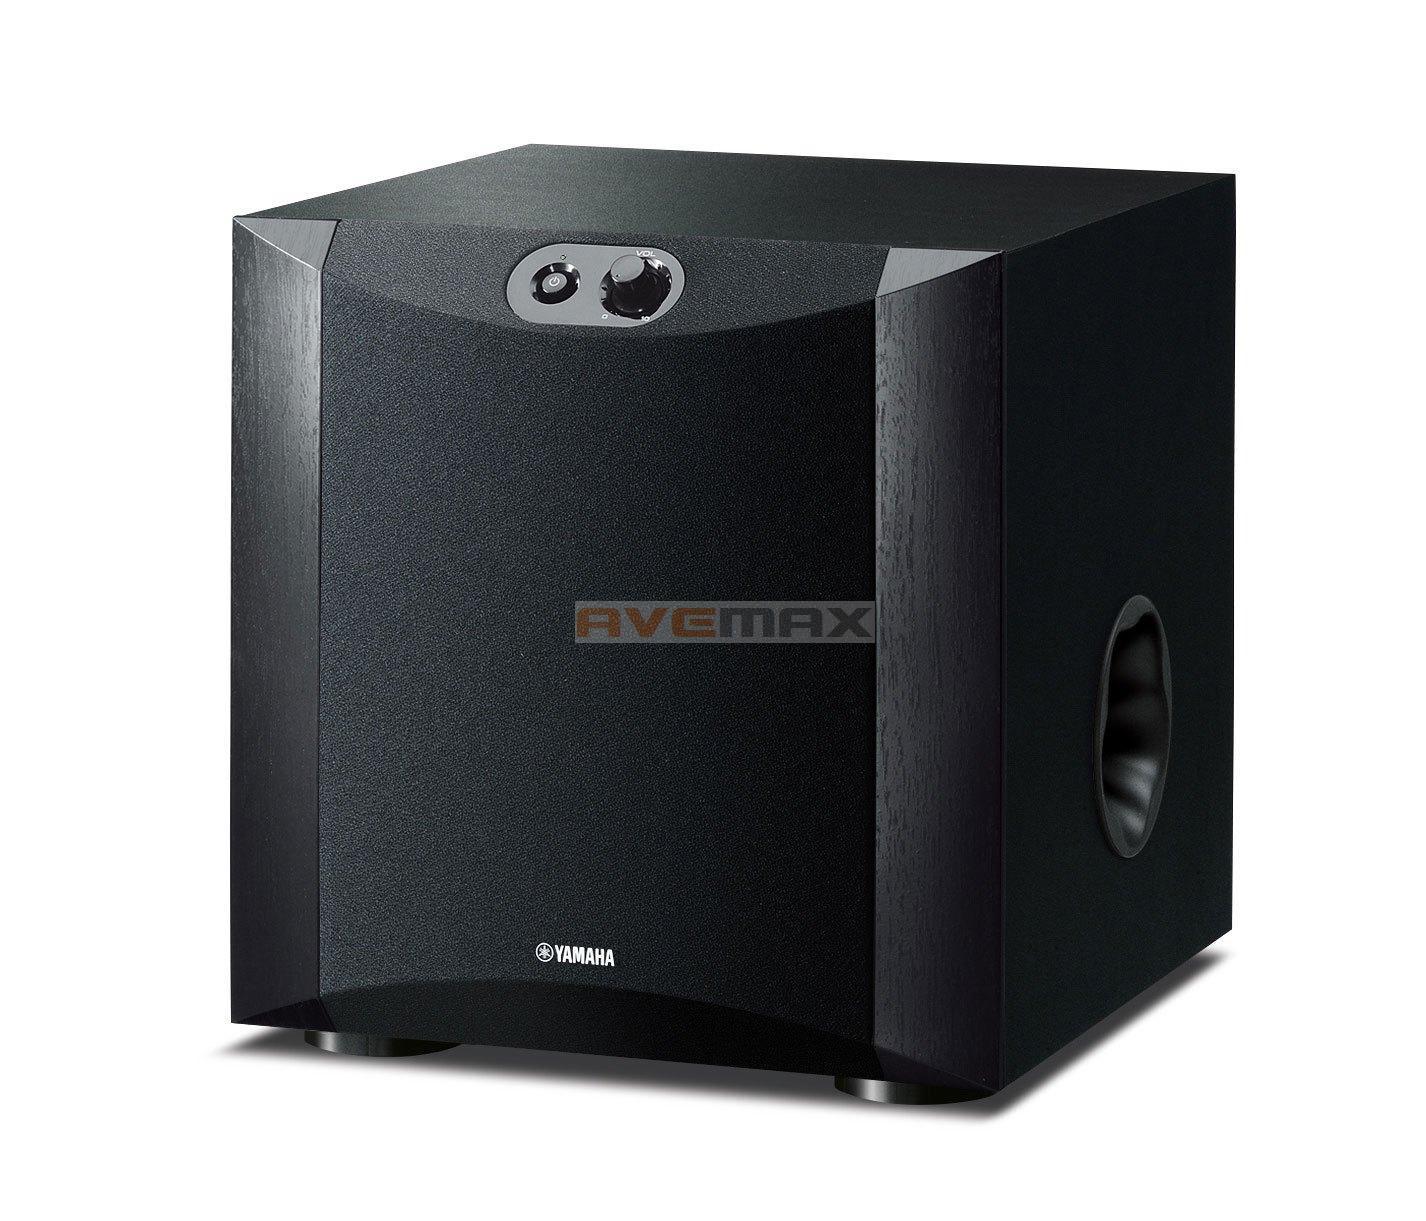 yamaha ns sw200 black yamaha shop yamaha audio premium. Black Bedroom Furniture Sets. Home Design Ideas